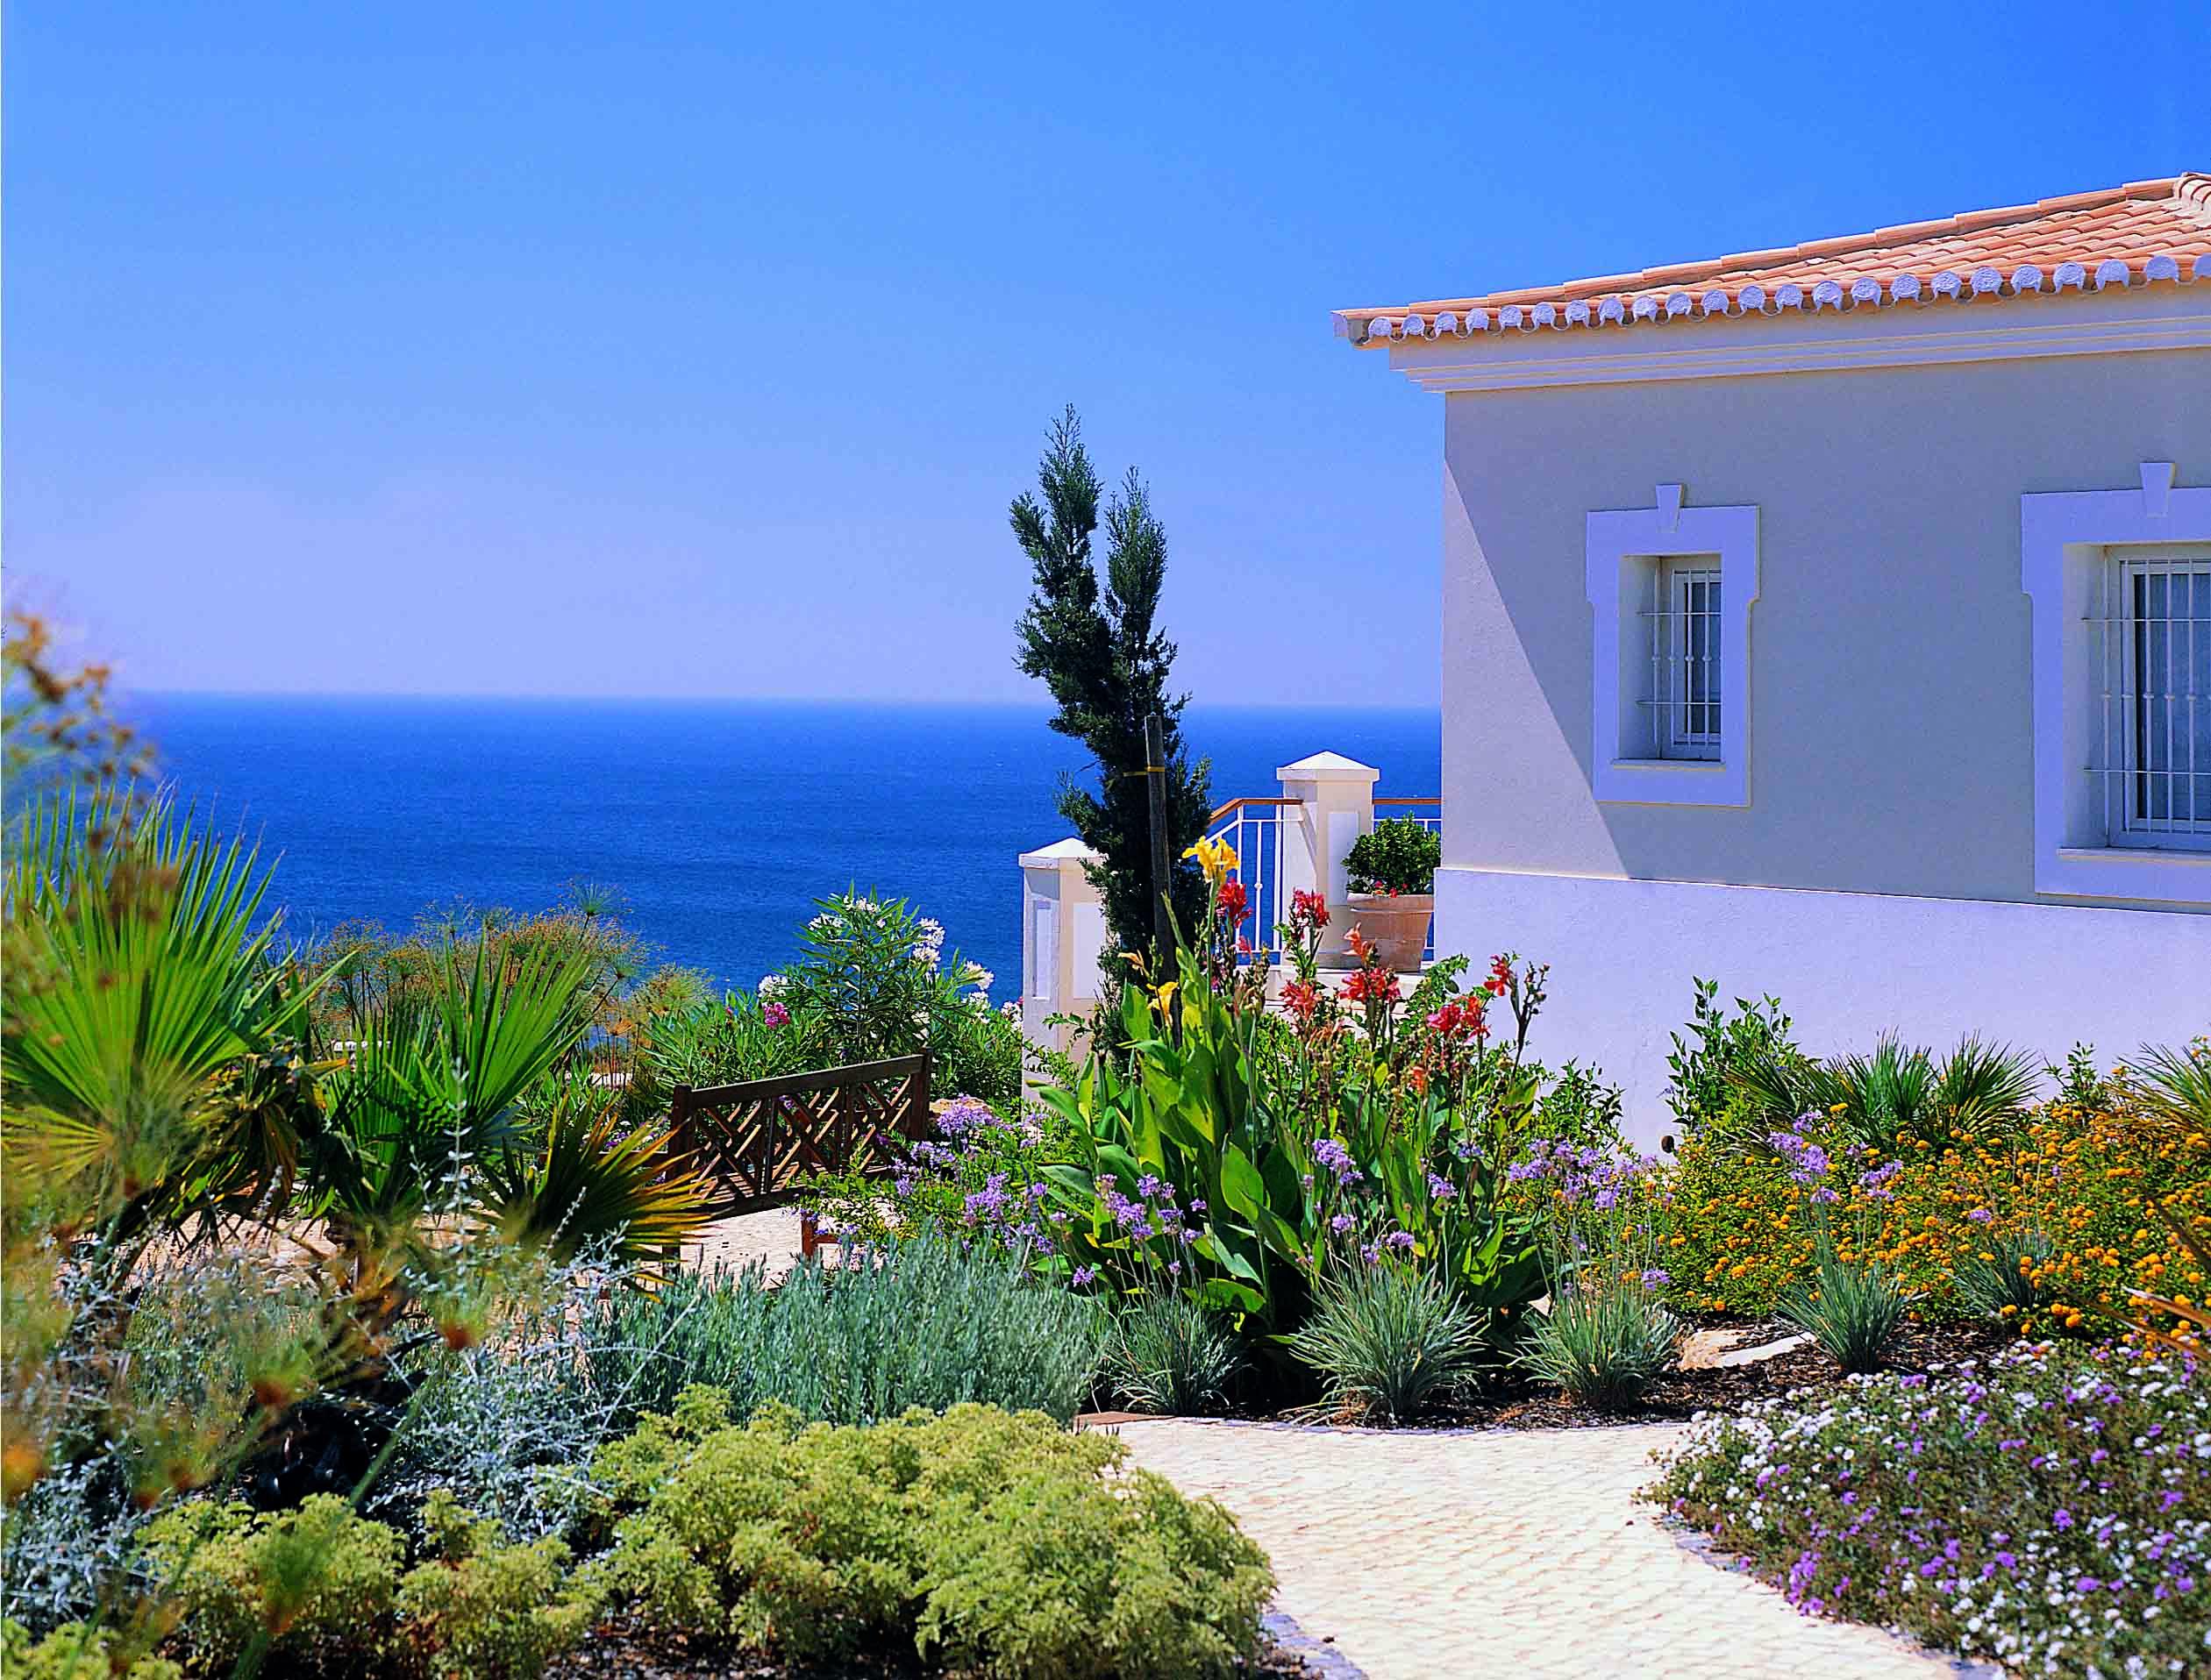 Stunning Villa with Sea Views in Praia da Luz  - Algarve